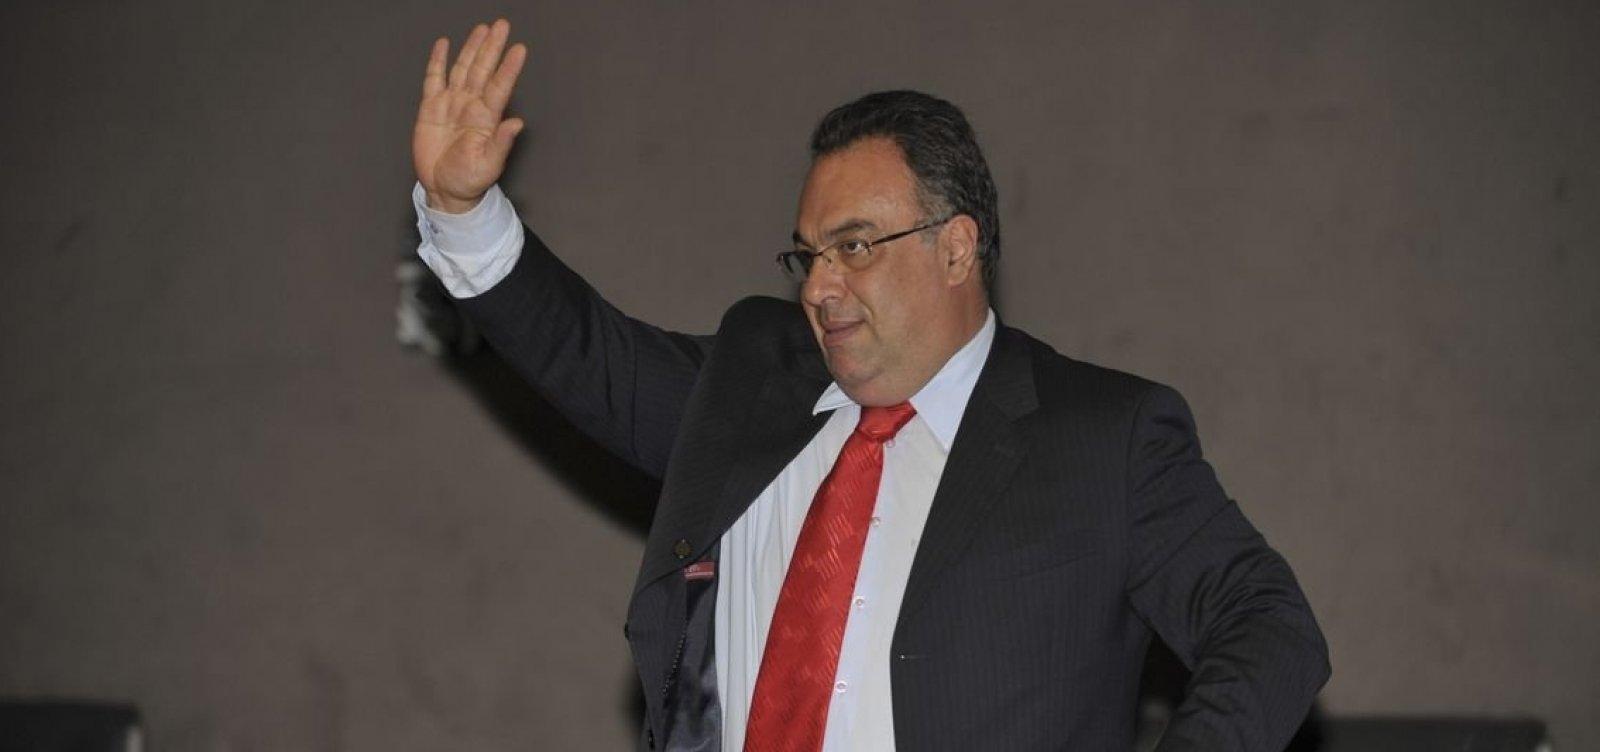 Primeiro político condenado pela Lava Jato é solto